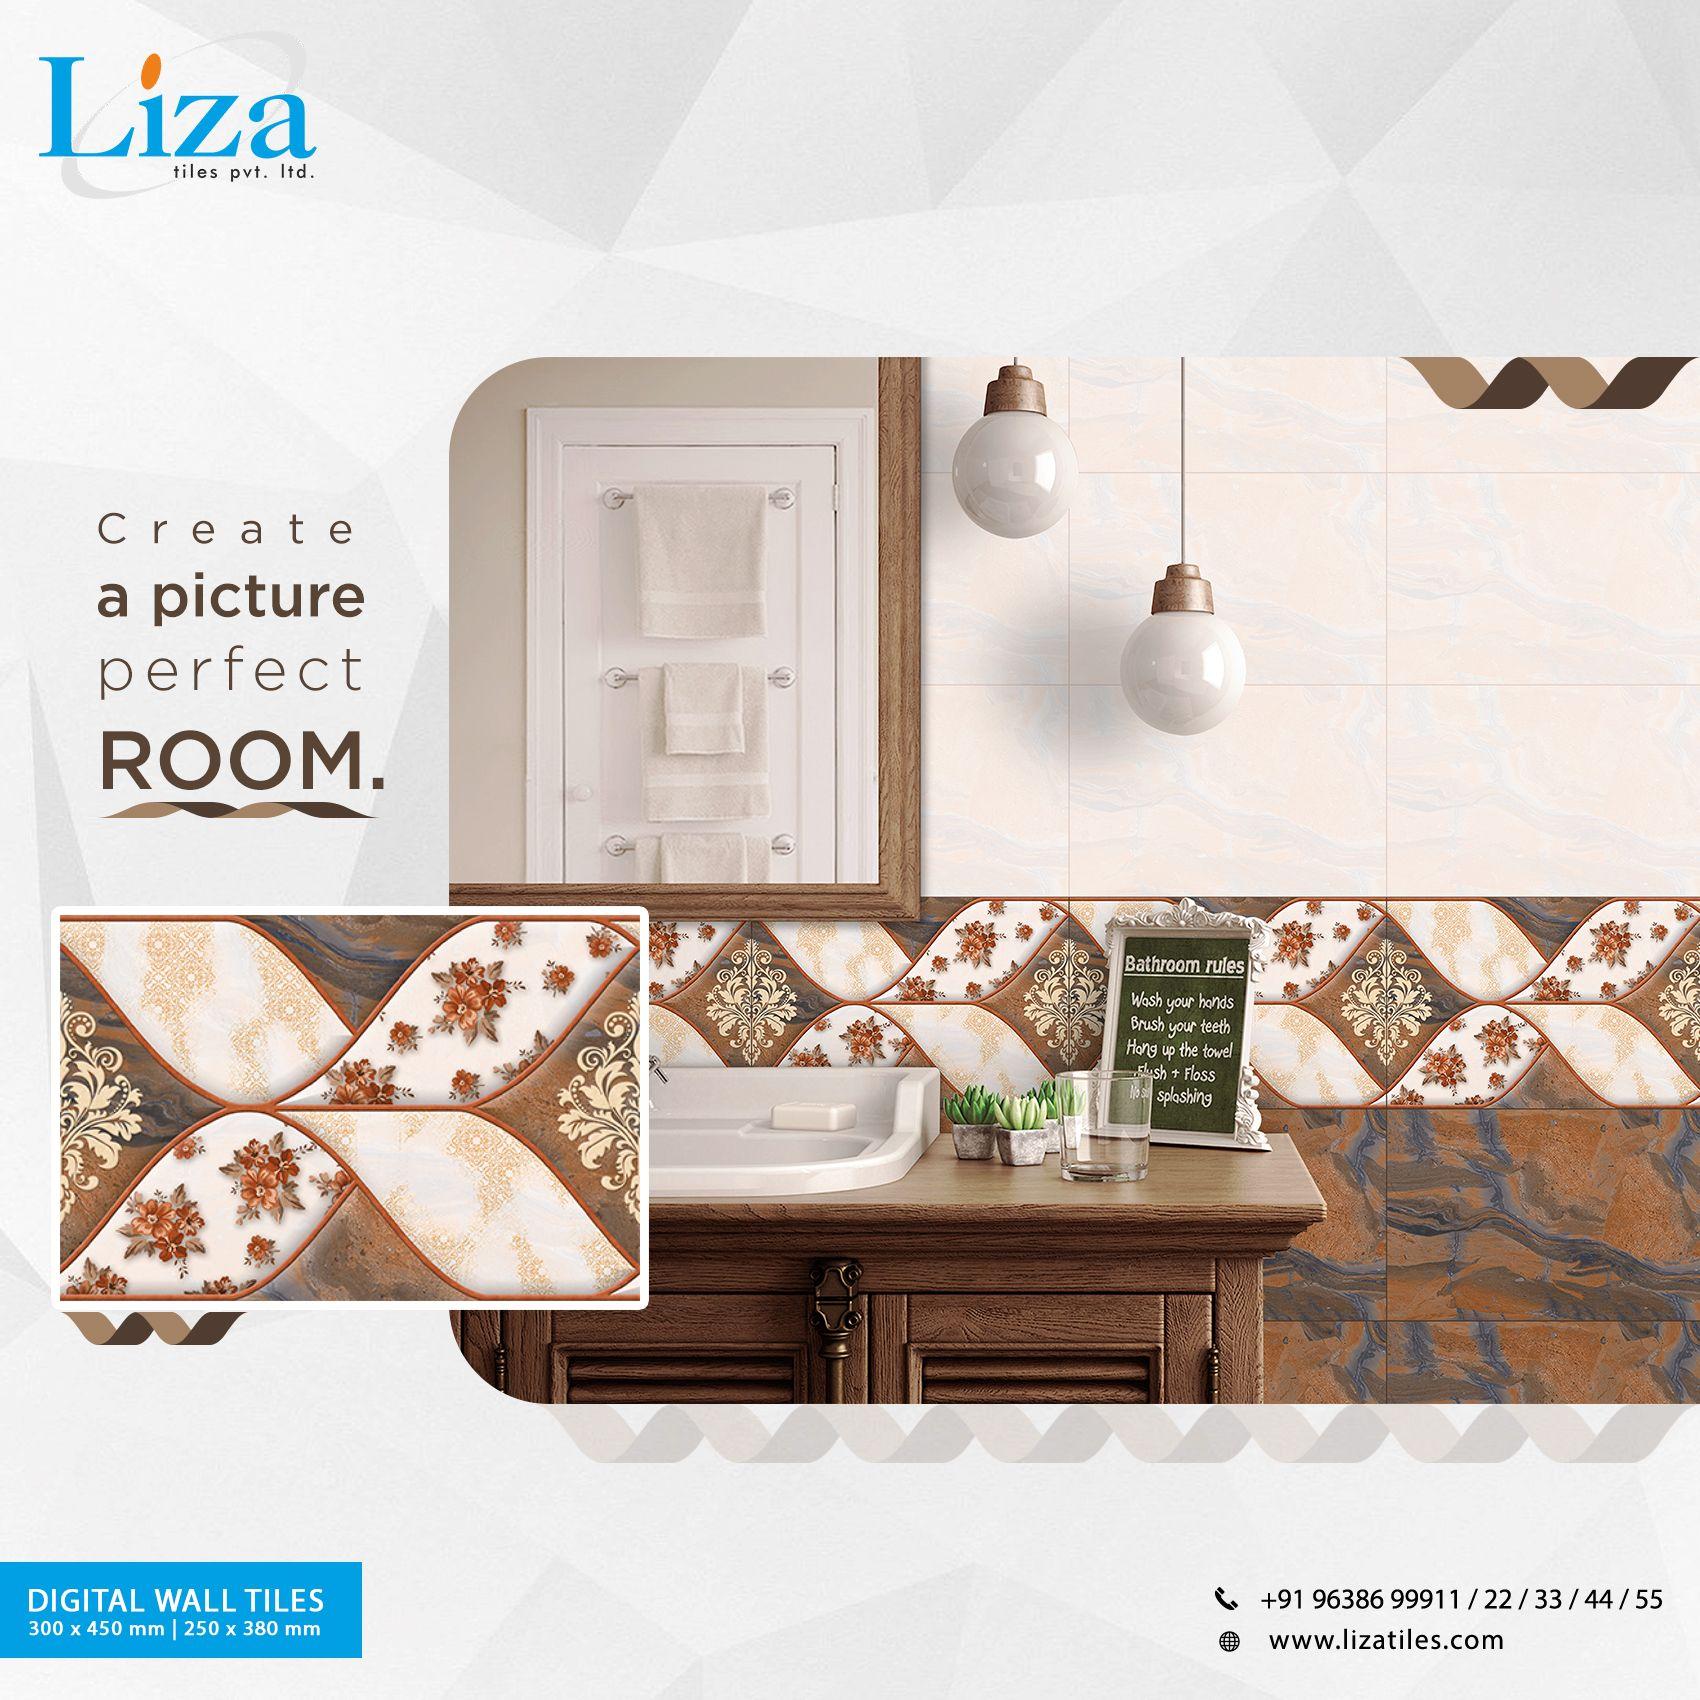 Create A Picture Perfect Room Lizatilespvtltd Manufacturer Walldecor Liza Lizadesigns Housetiles Interiordesig Interior Tiles House Tiles Wall Tiles